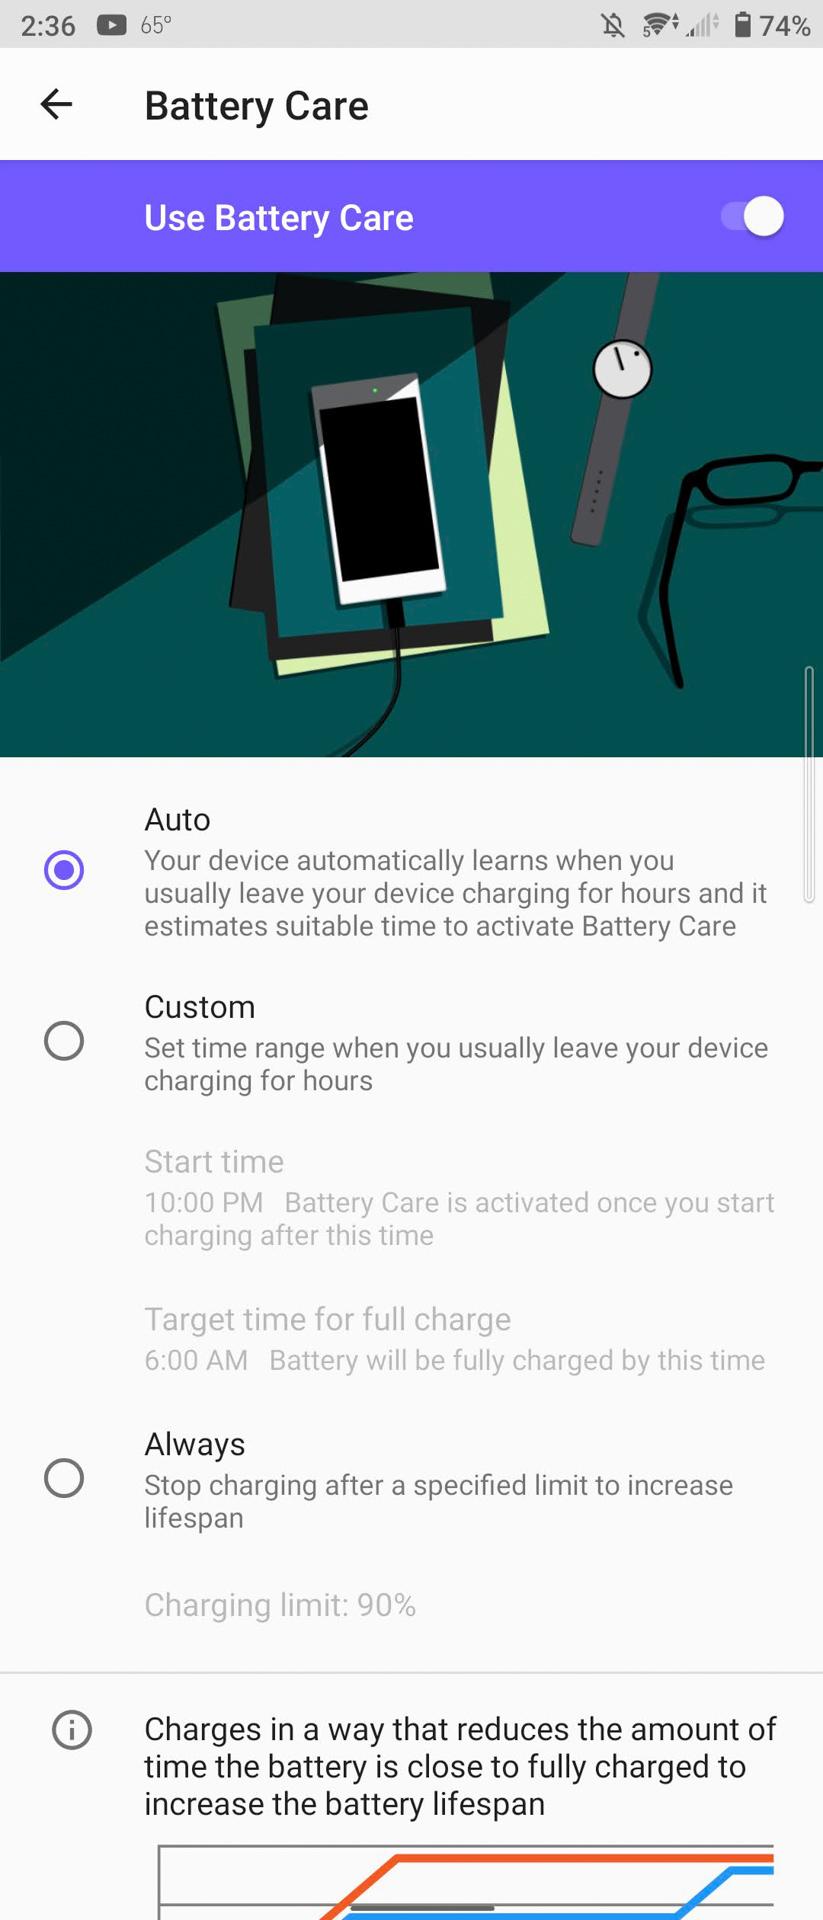 Sony Xperia 5 II battery care